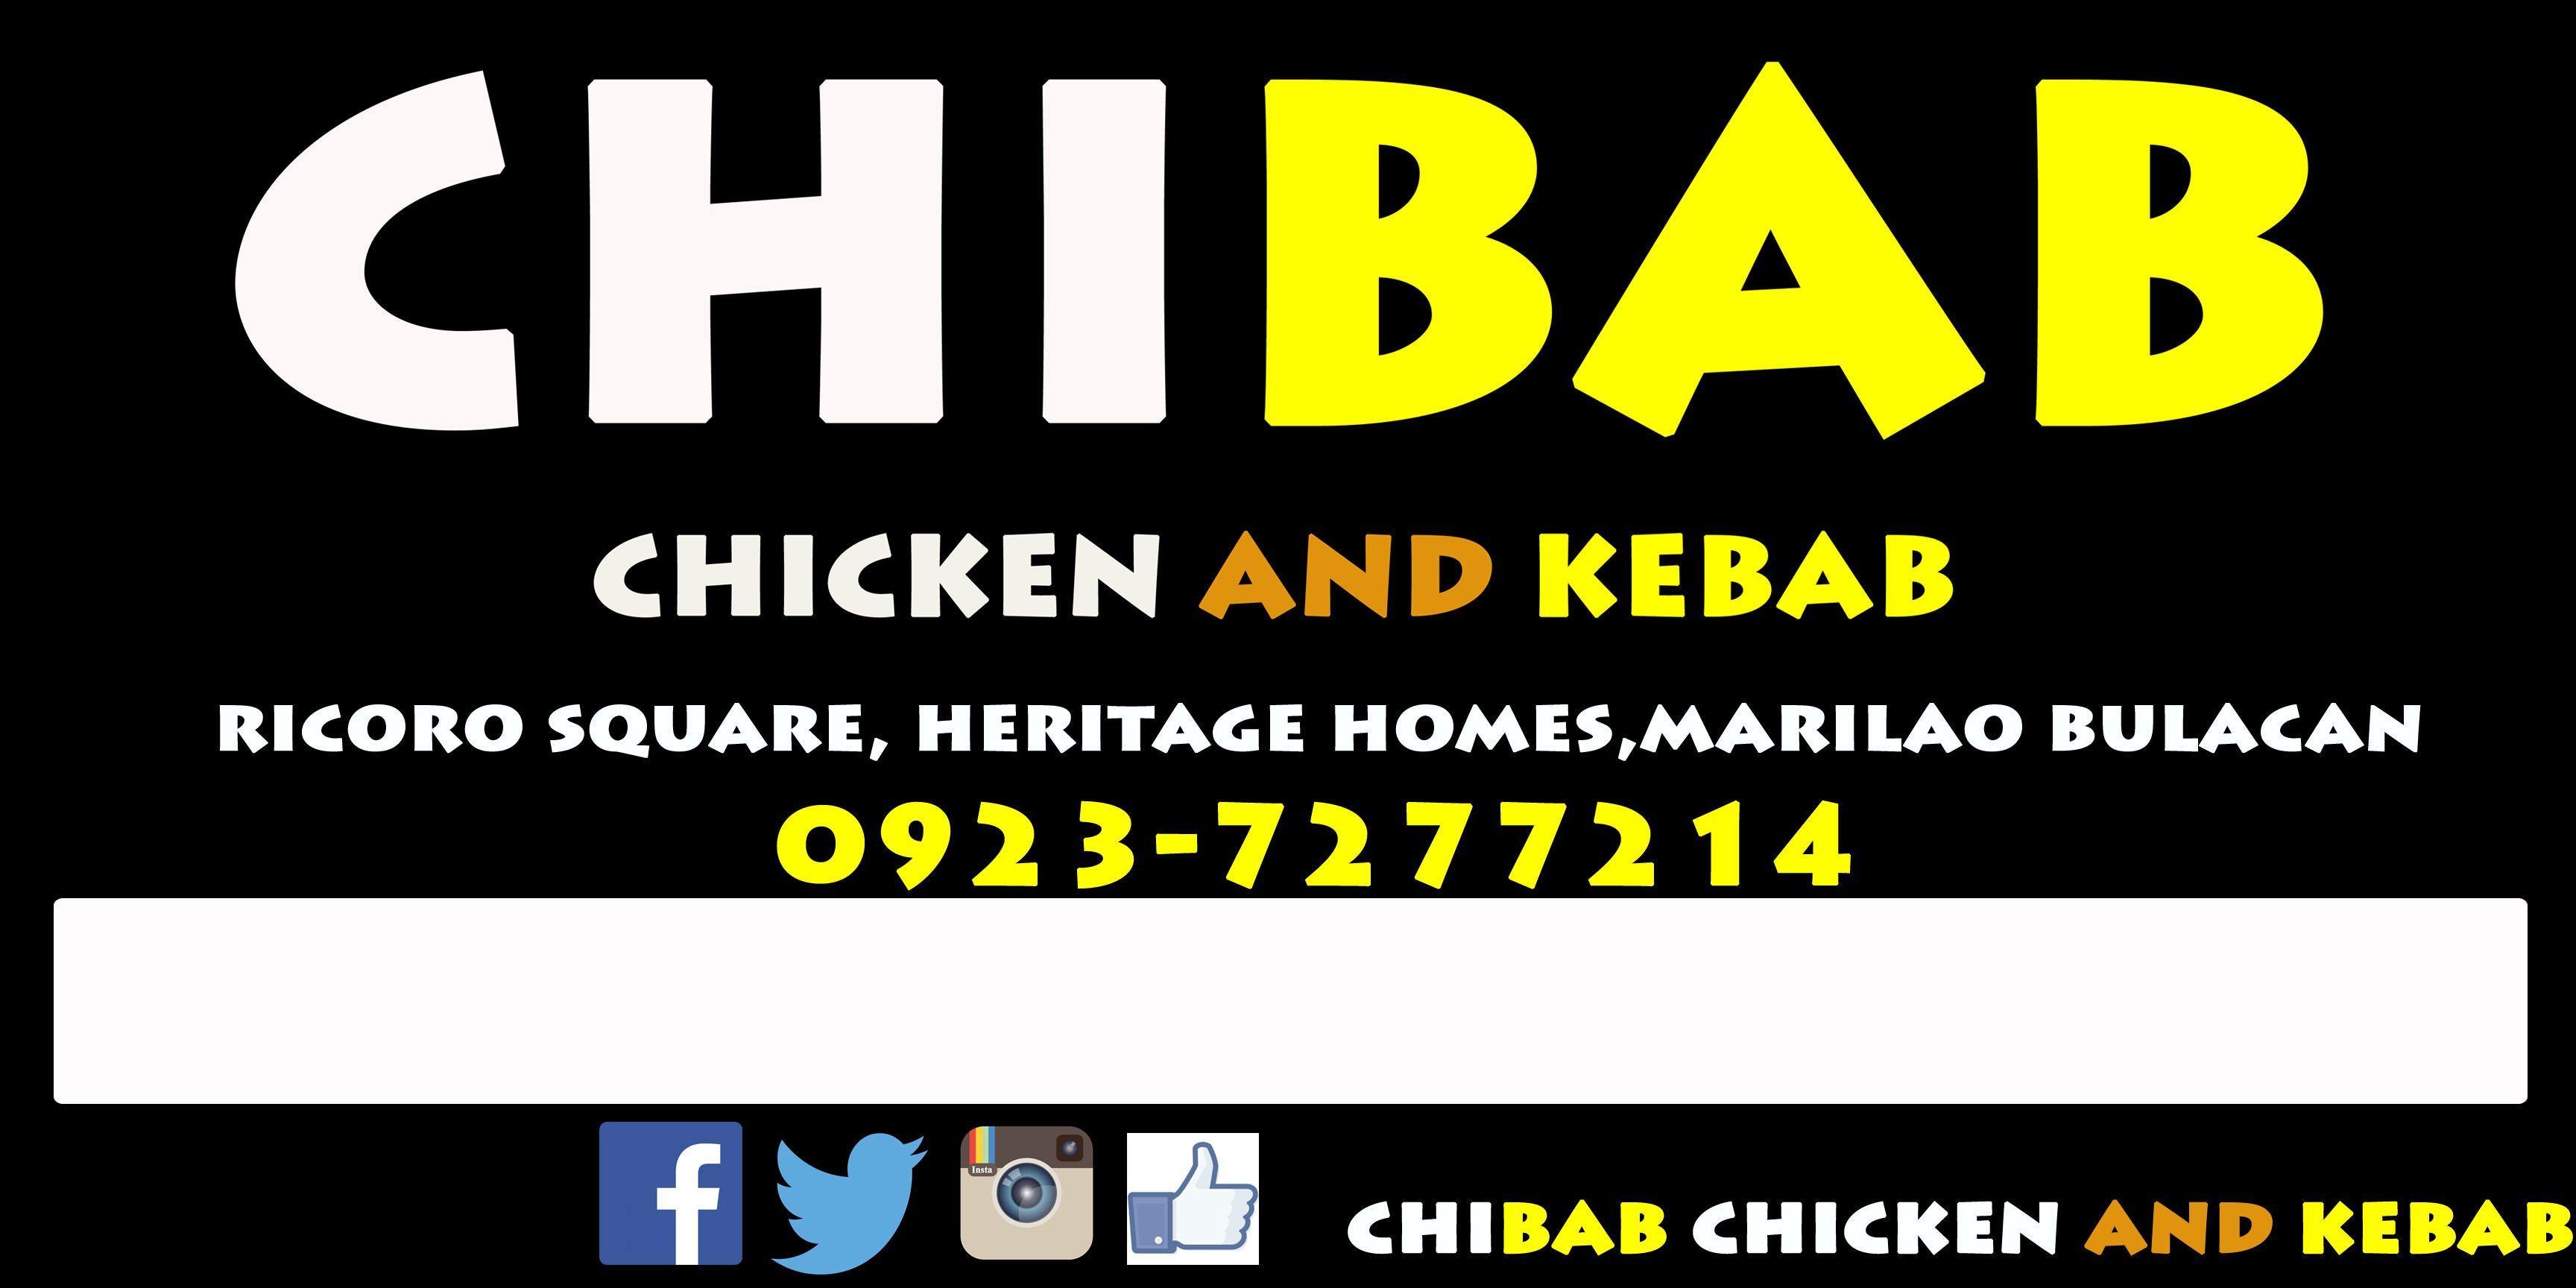 Chibab Chicken and Kebab